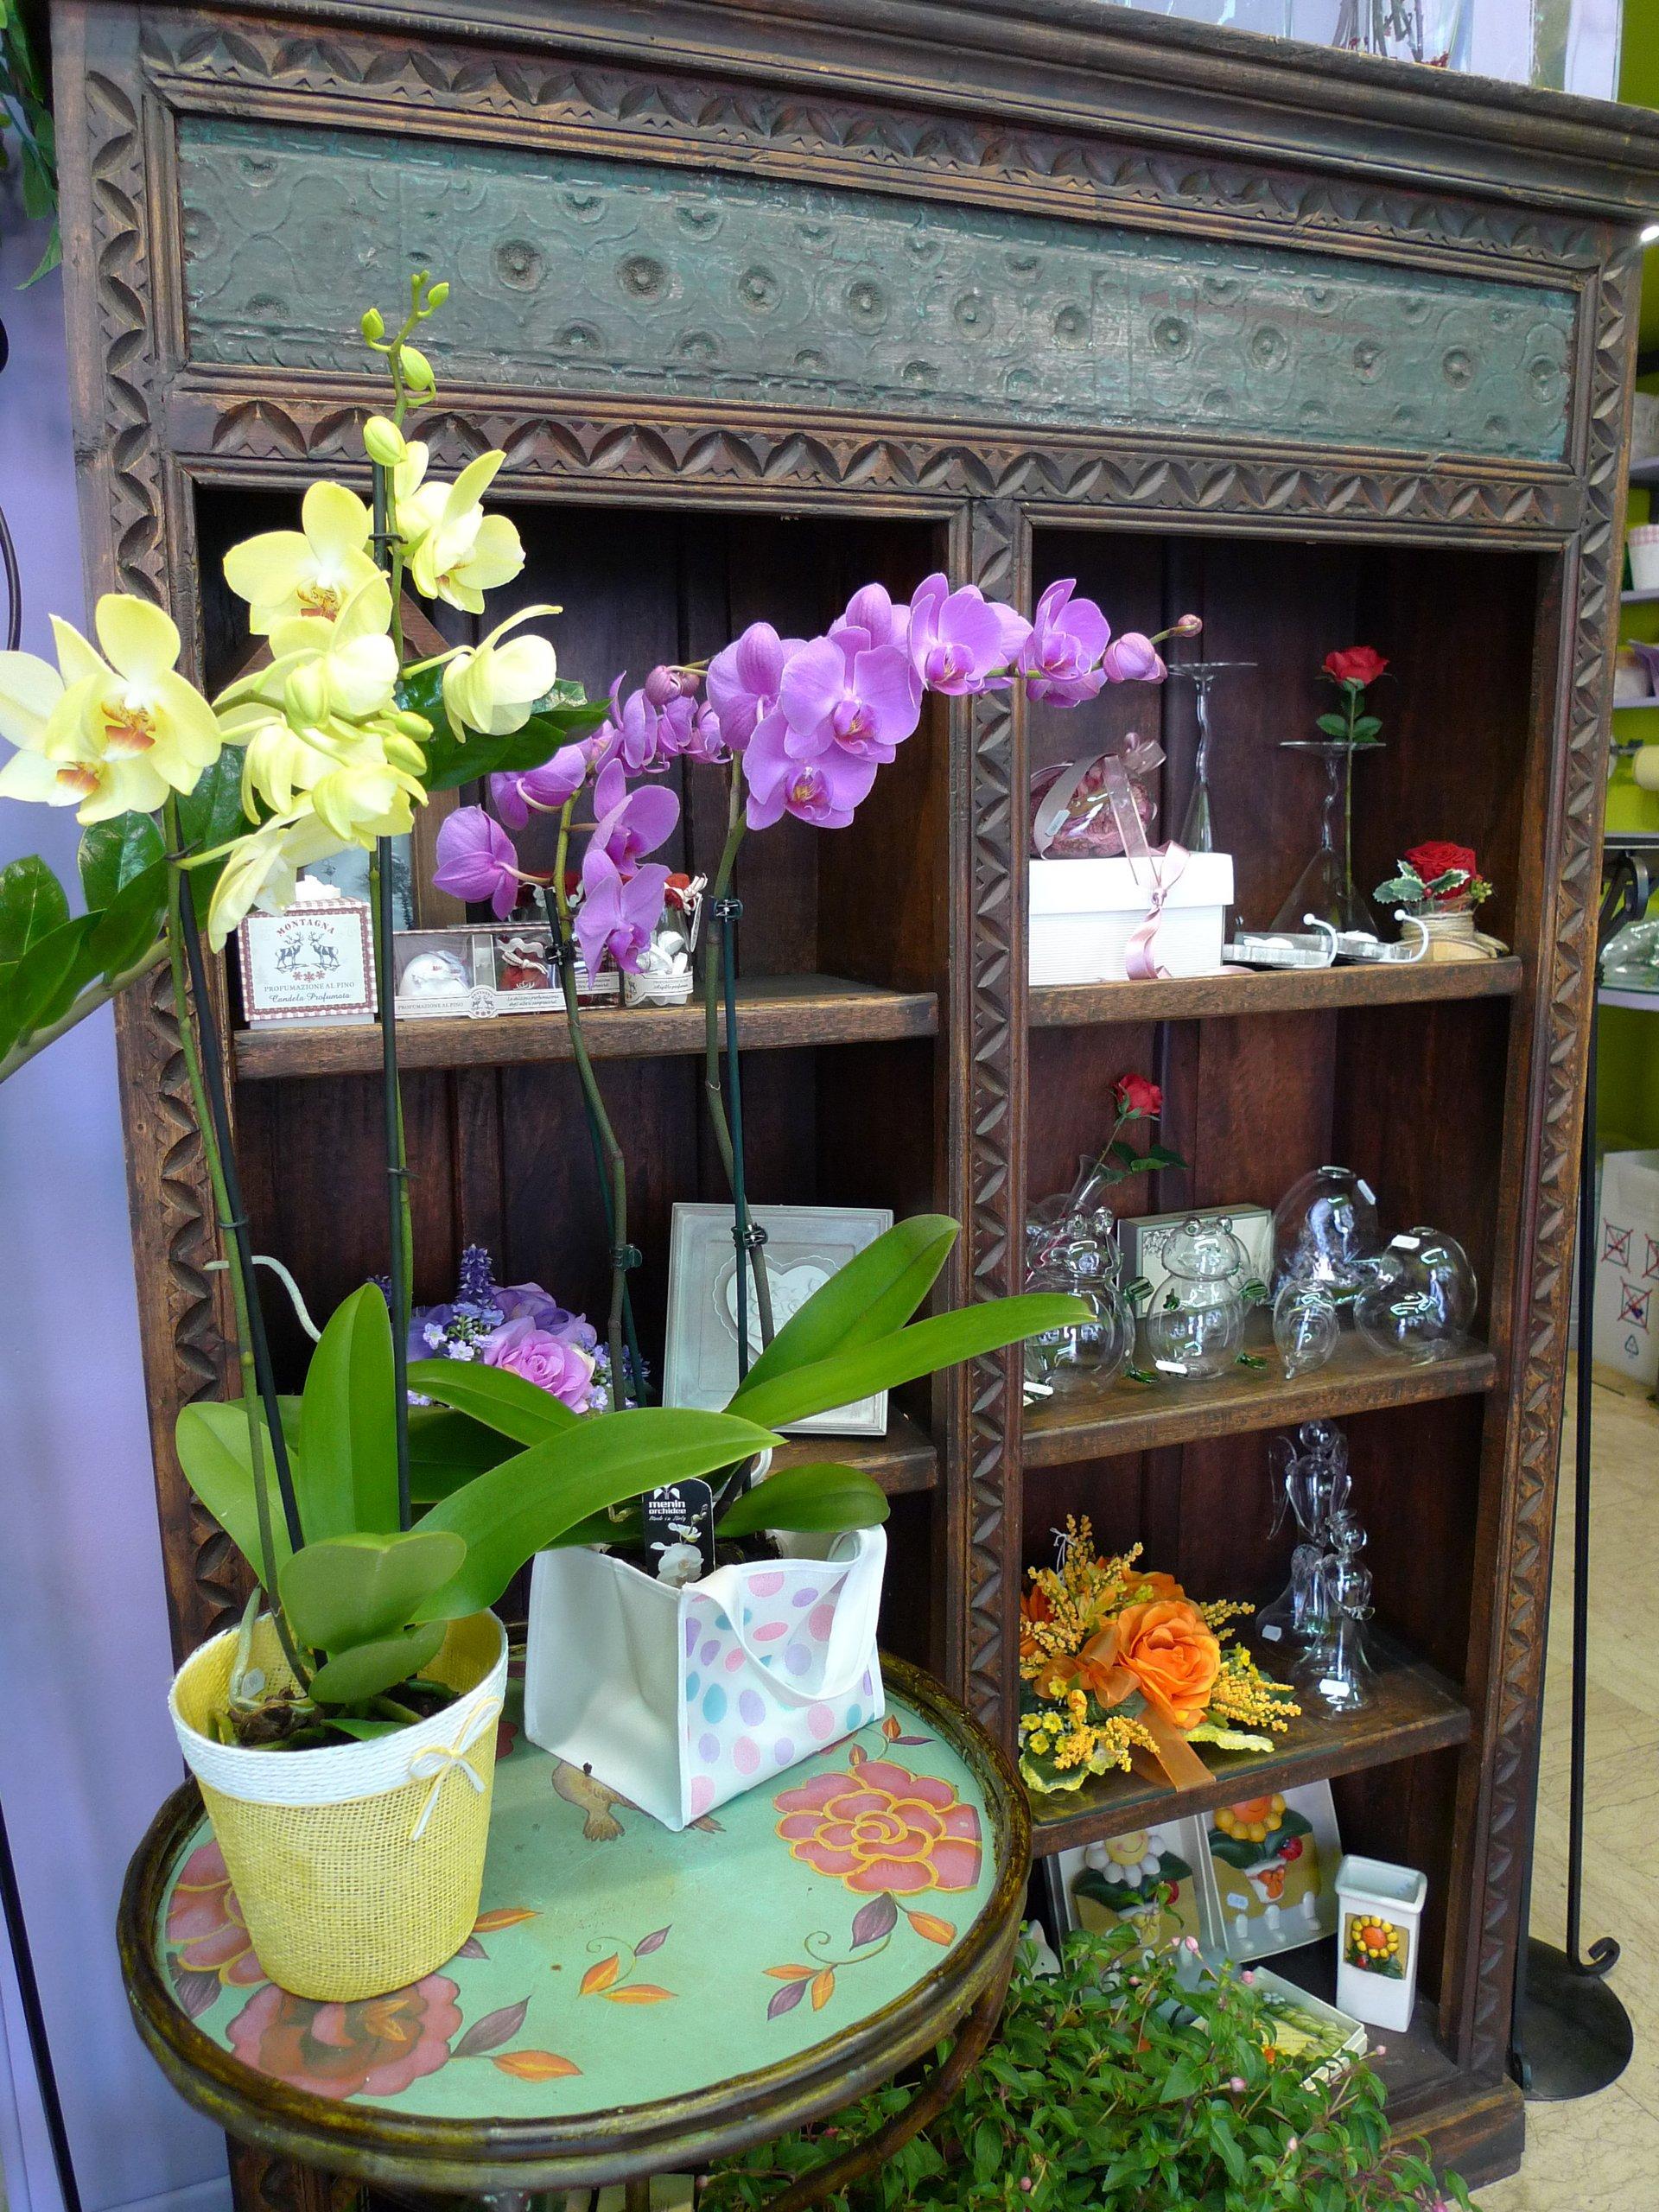 Vendita vasi arredo casorezzo milano arte e fiori for Vasi arredo